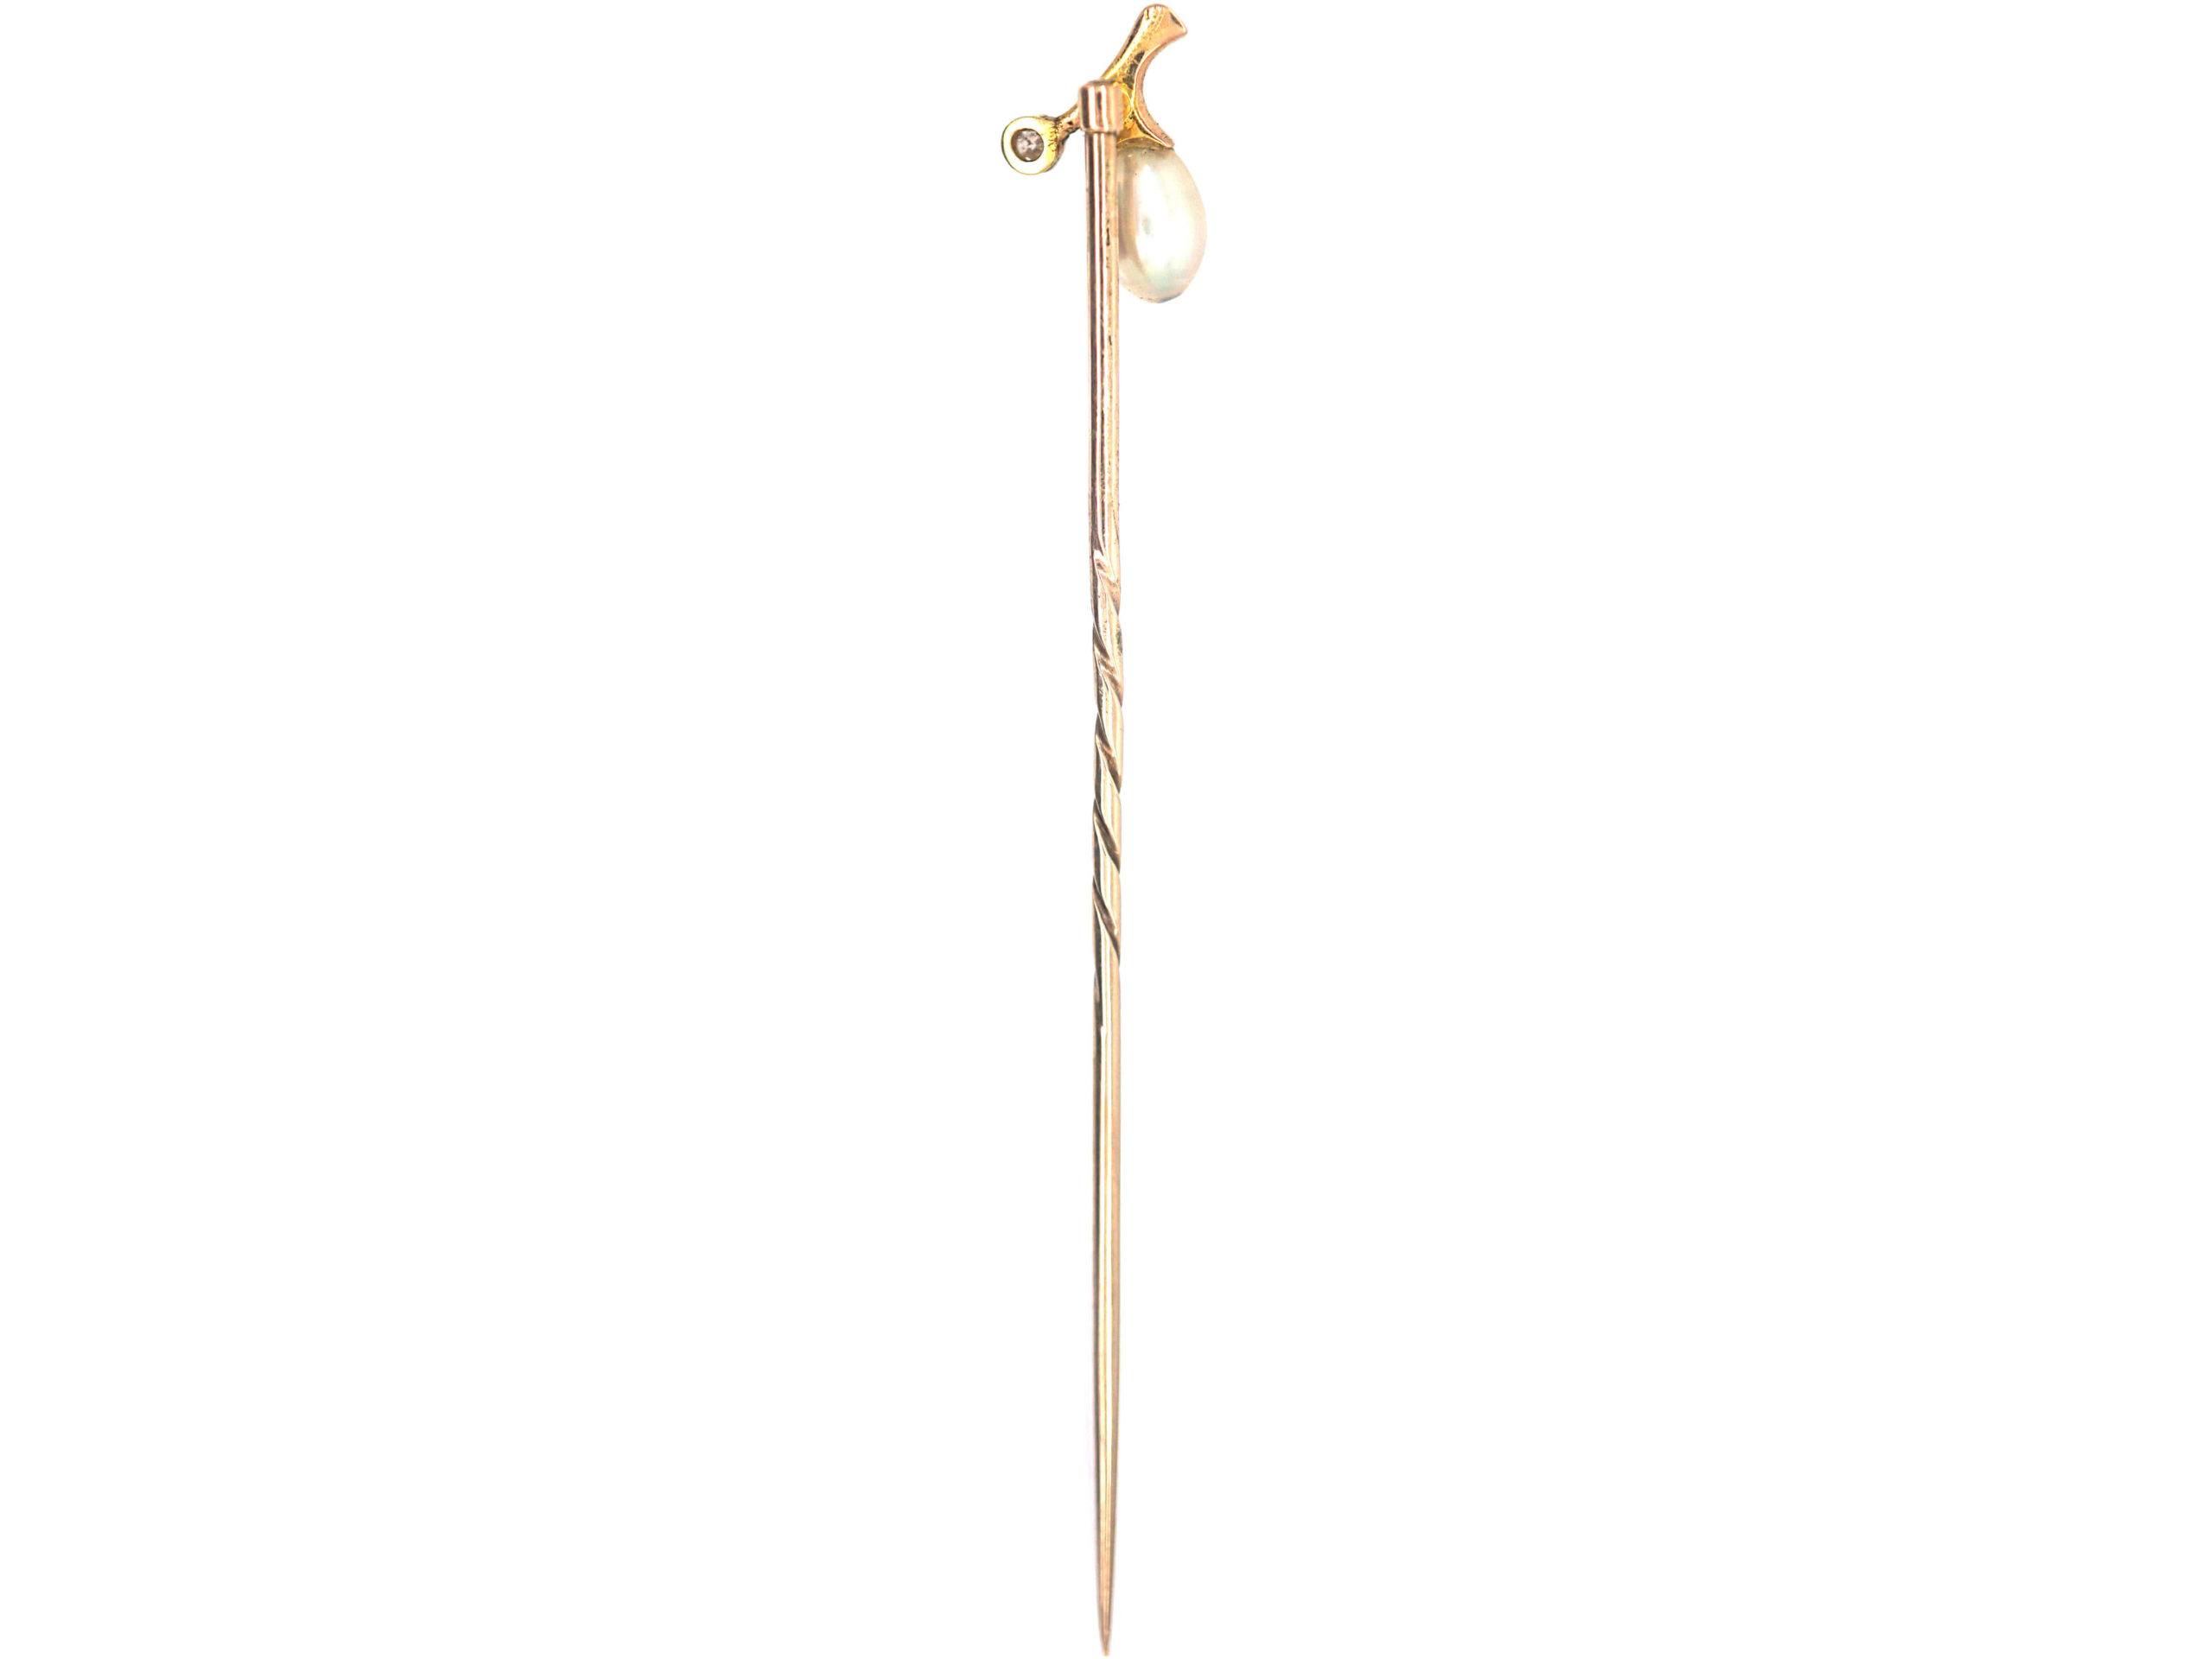 Edwardian Gold, Natural Pearl & Diamond Sprig Tie Pin